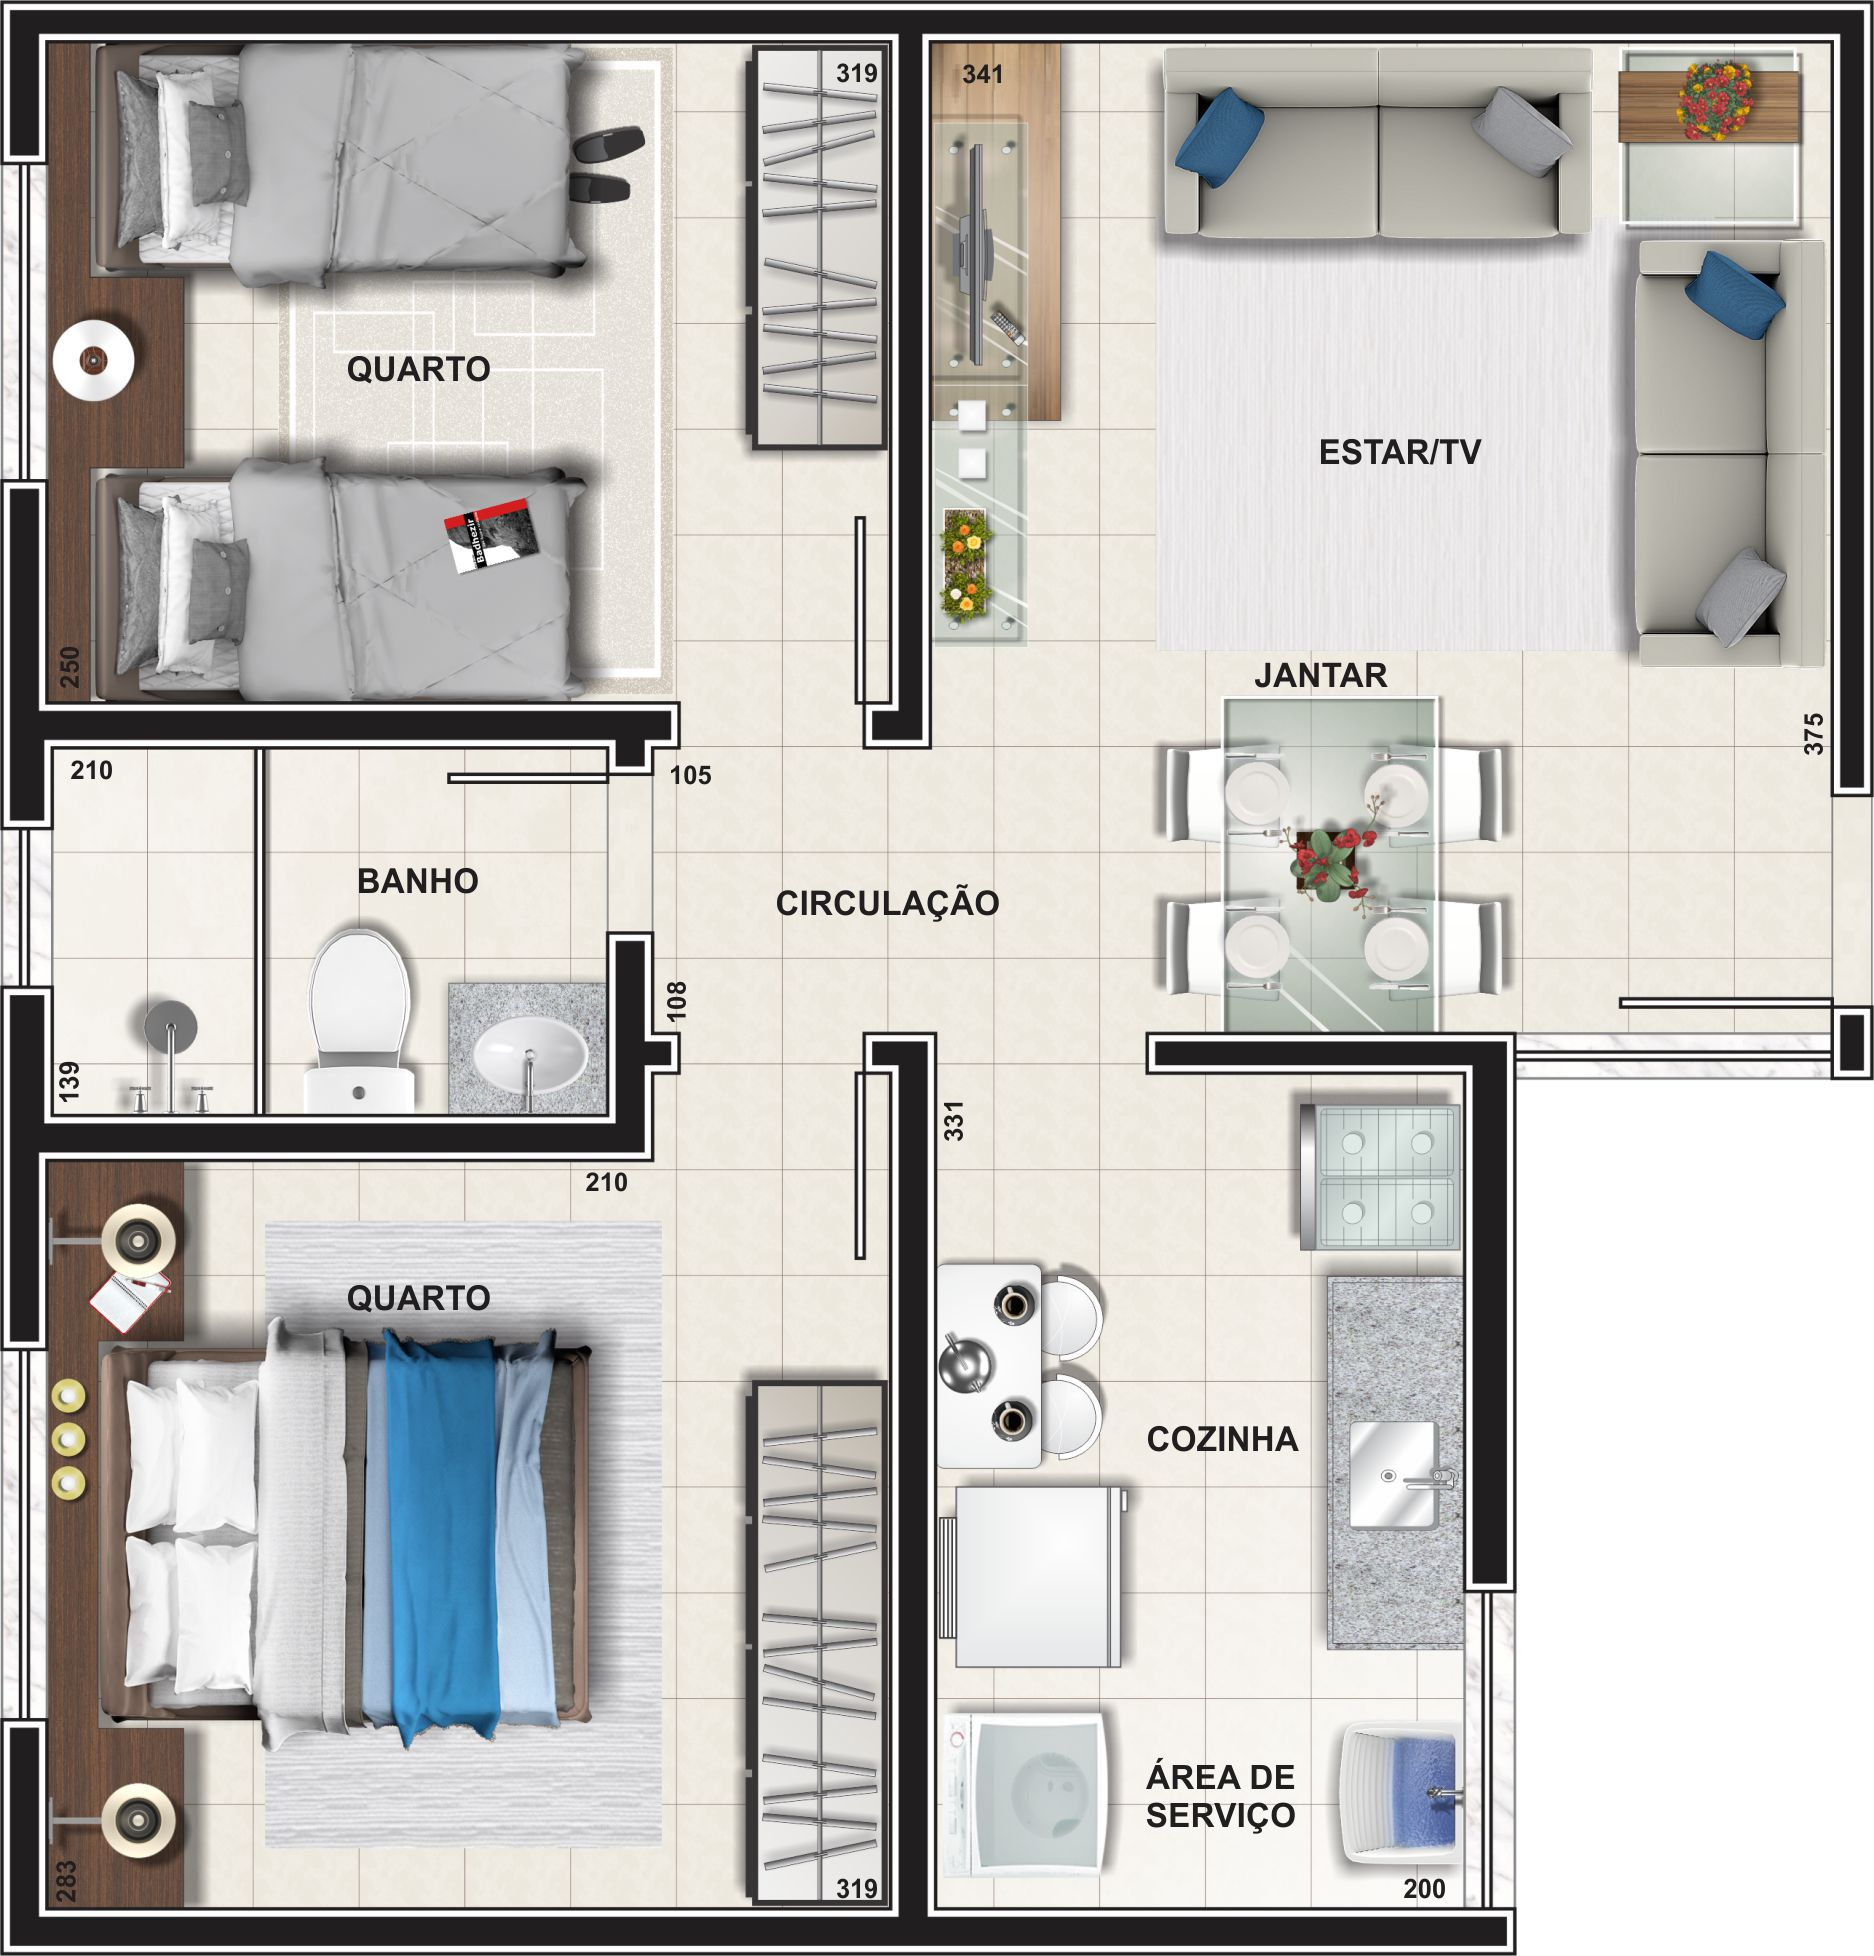 Planta Apartamento - Tipo 01 46.88 m²